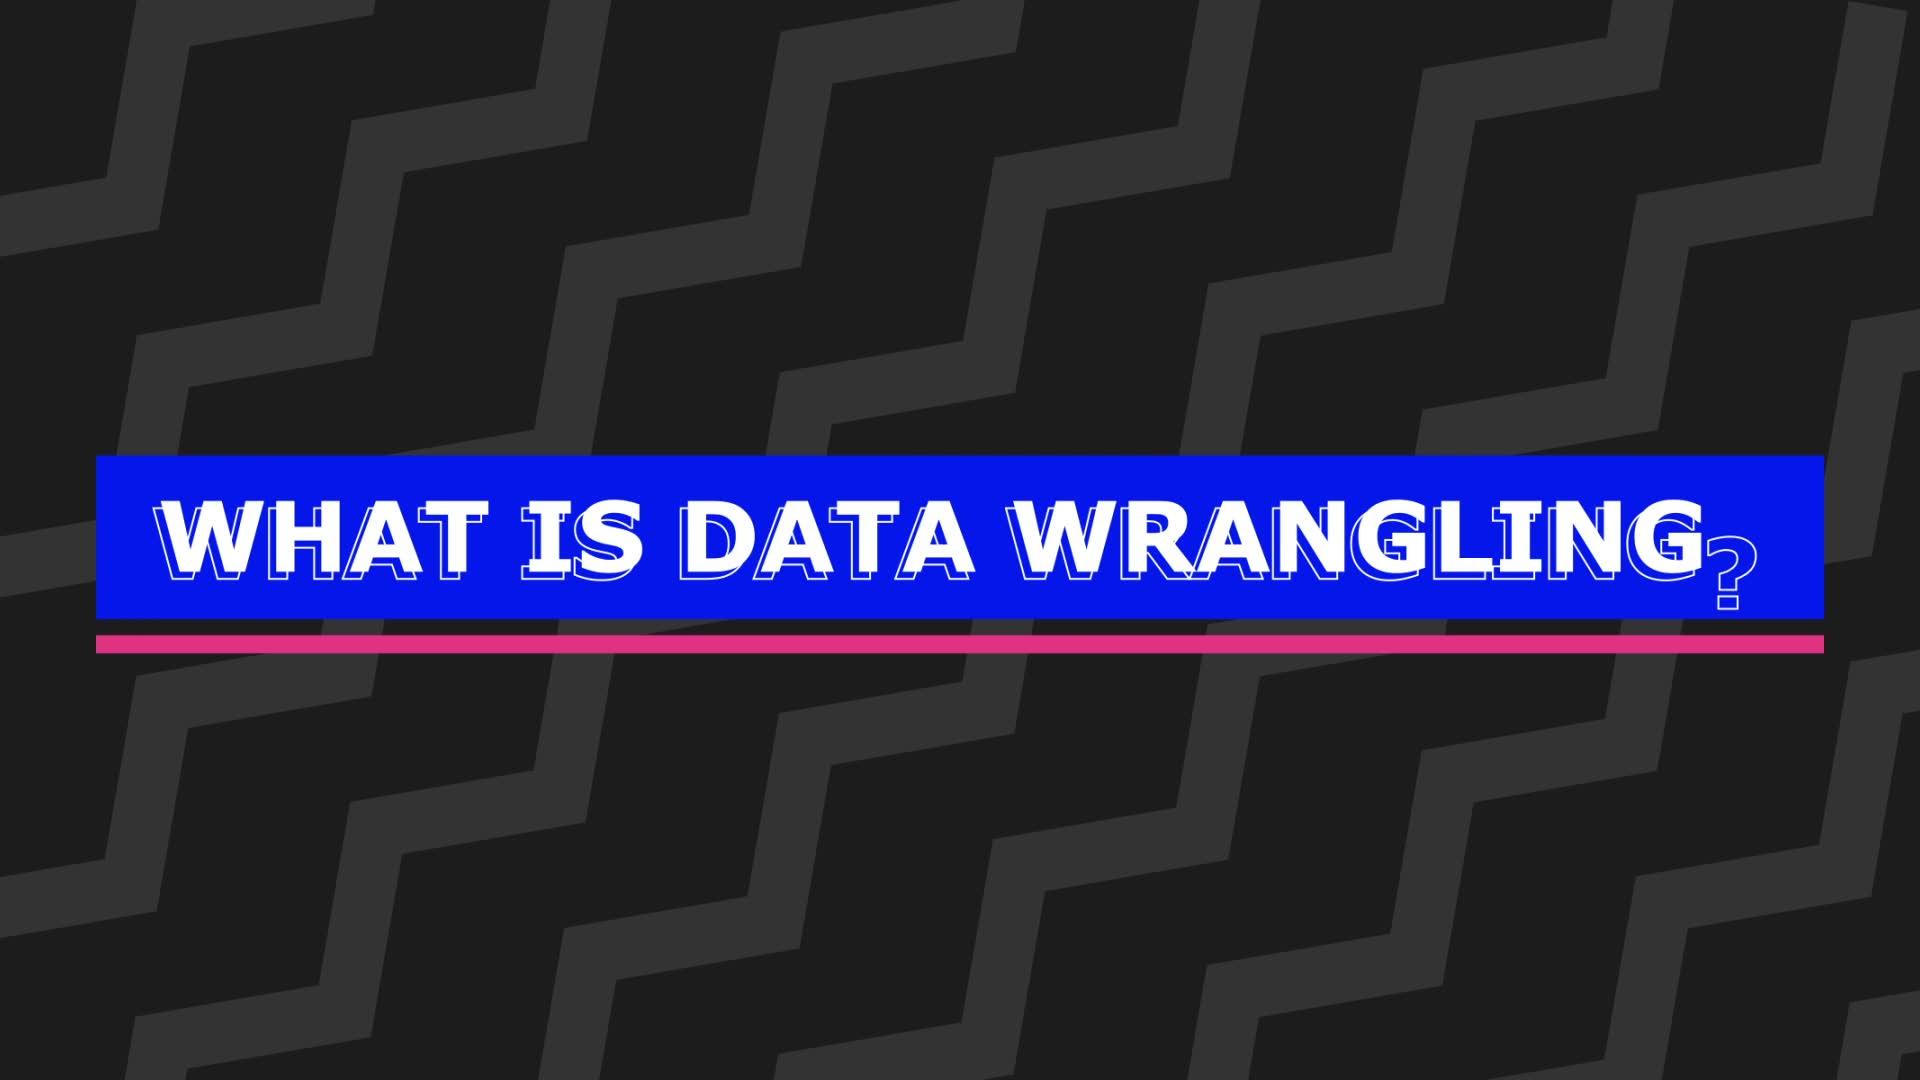 CRISP-DM and Data Wrangling